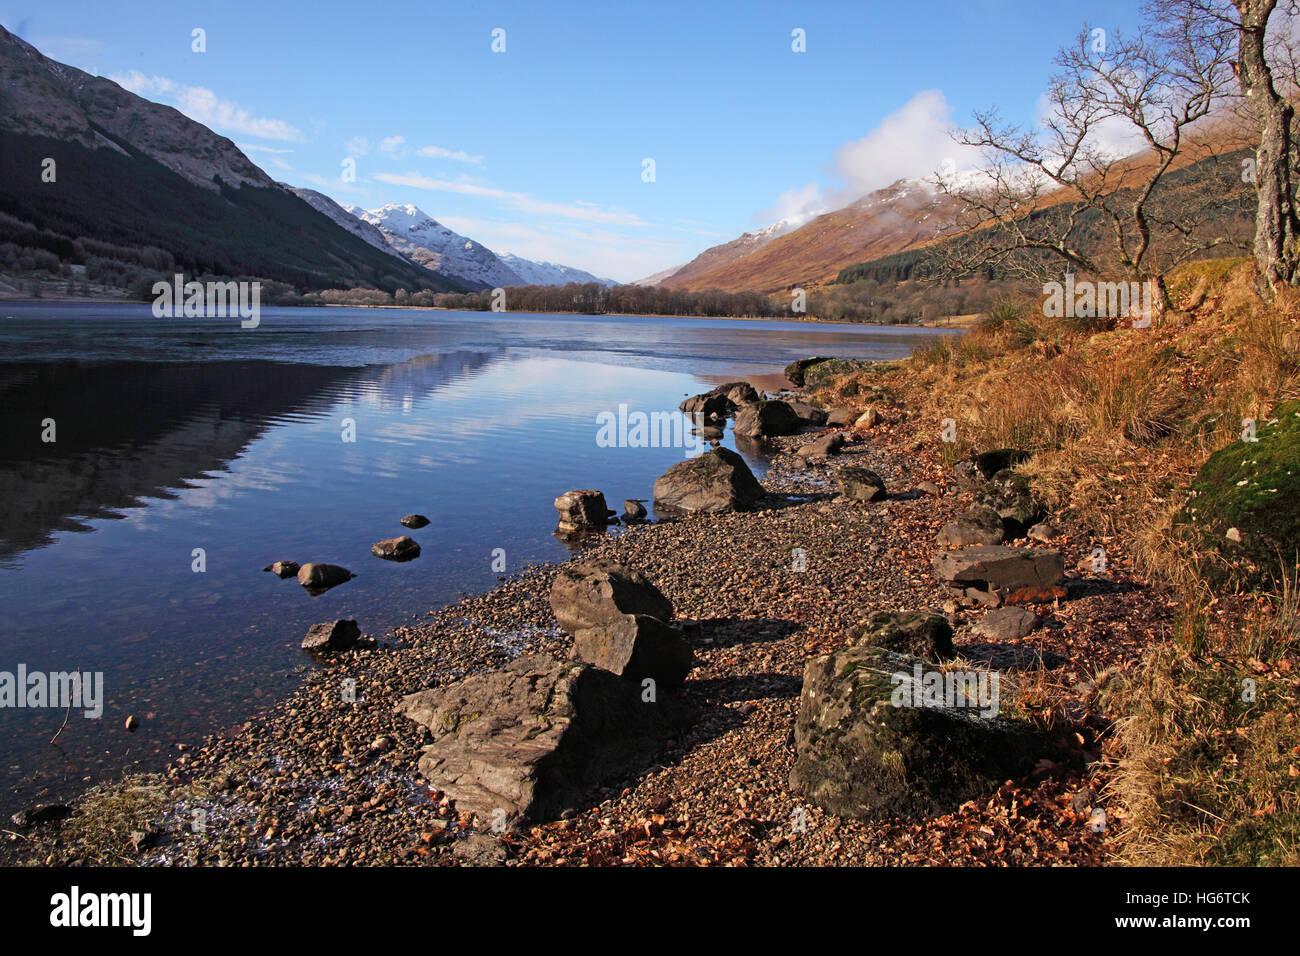 Laden Sie dieses Alamy Stockfoto Balquhidder, Sterling, Schottland, UK - Rob Roy rot MacGregors Ruhestätte - HG6TCK